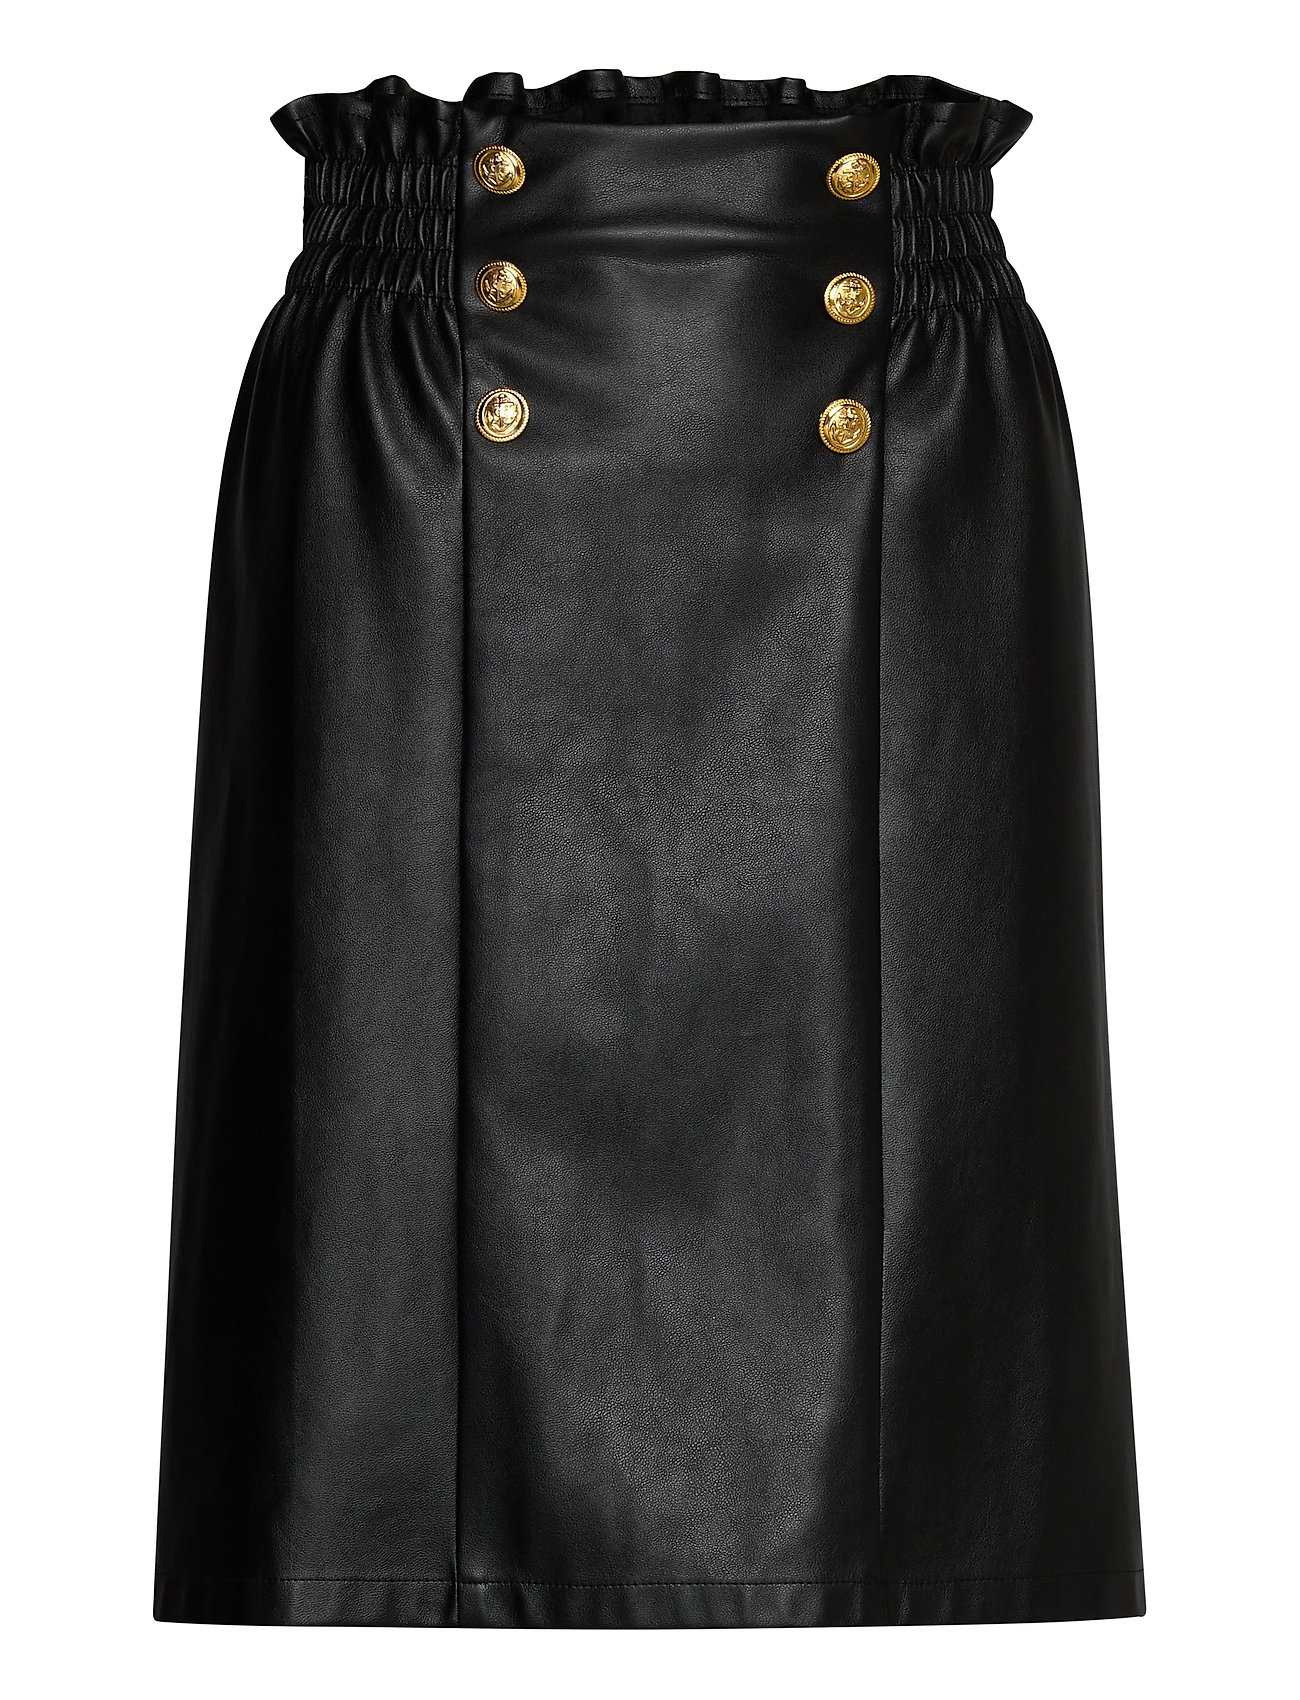 Ida Sjöstedt Keeley Skirt - BLACK